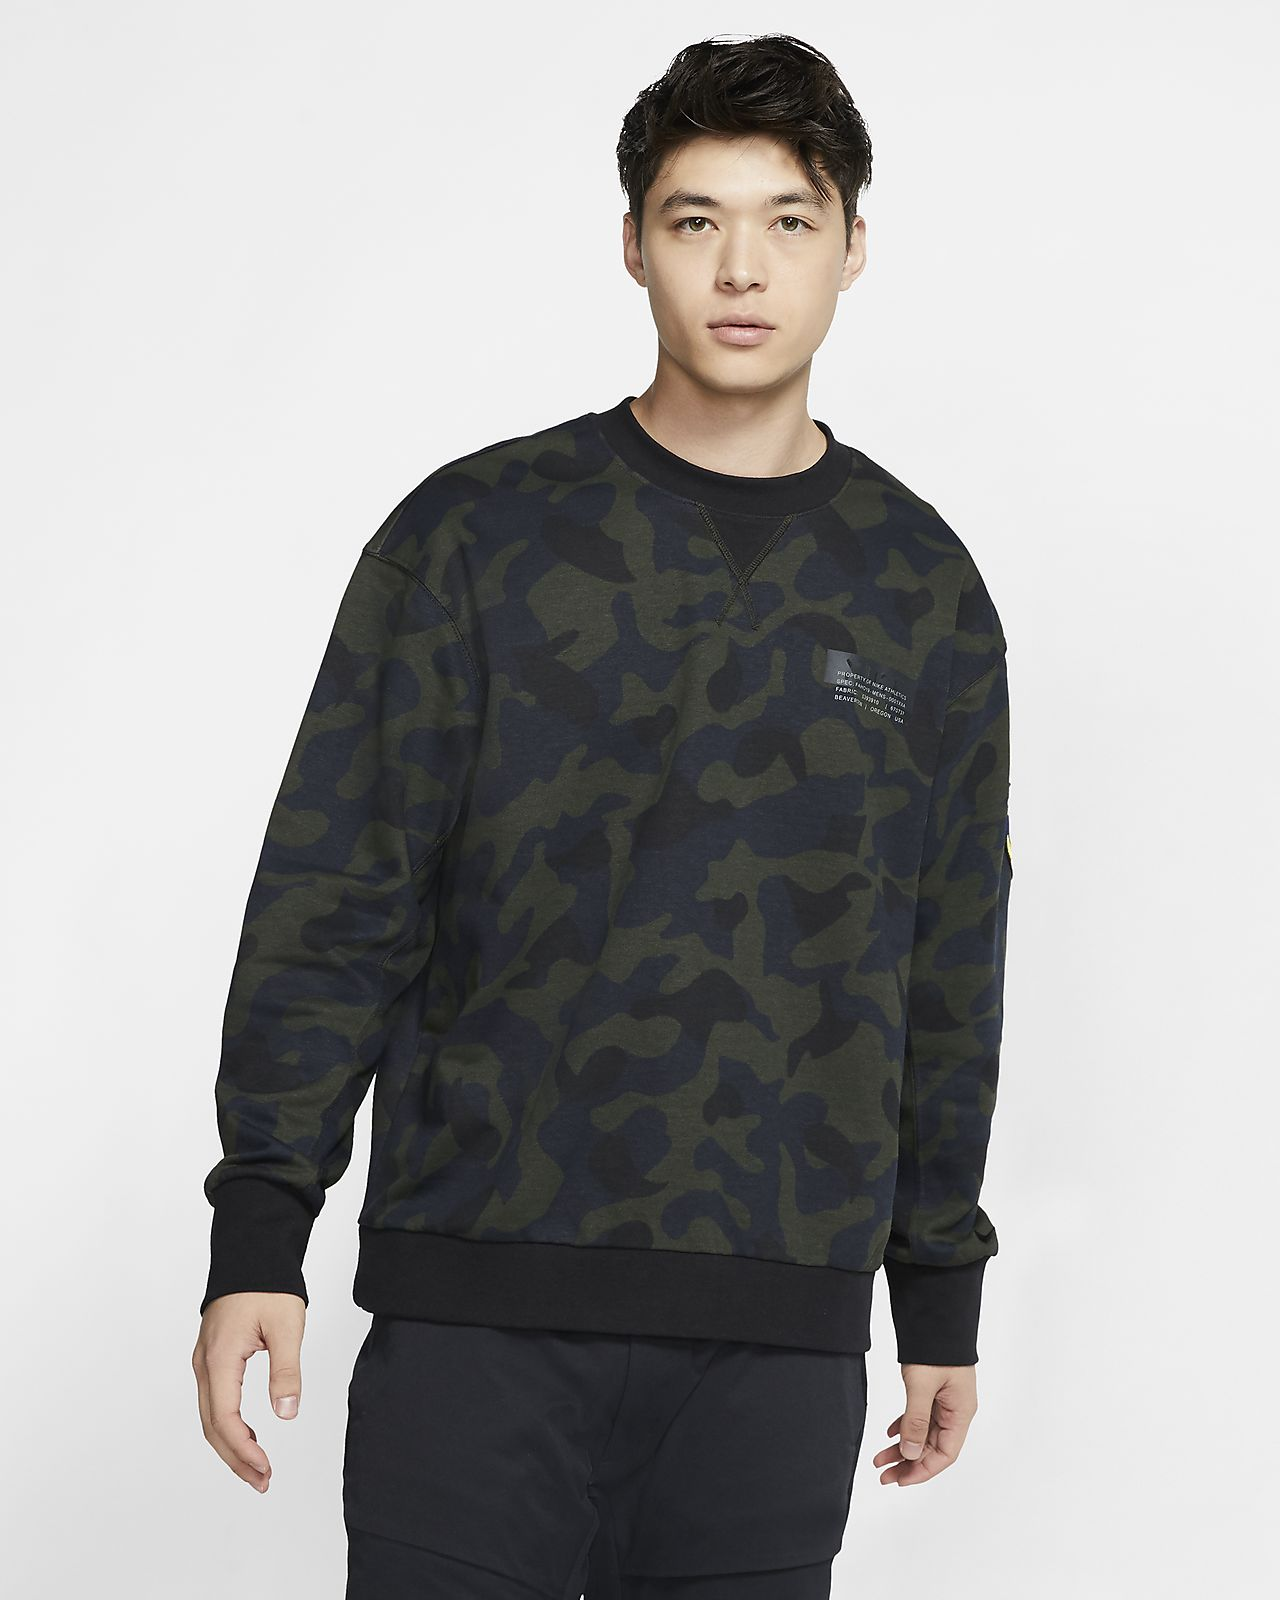 Nike Sportswear 男款法國毛圈布貼身圓領上衣